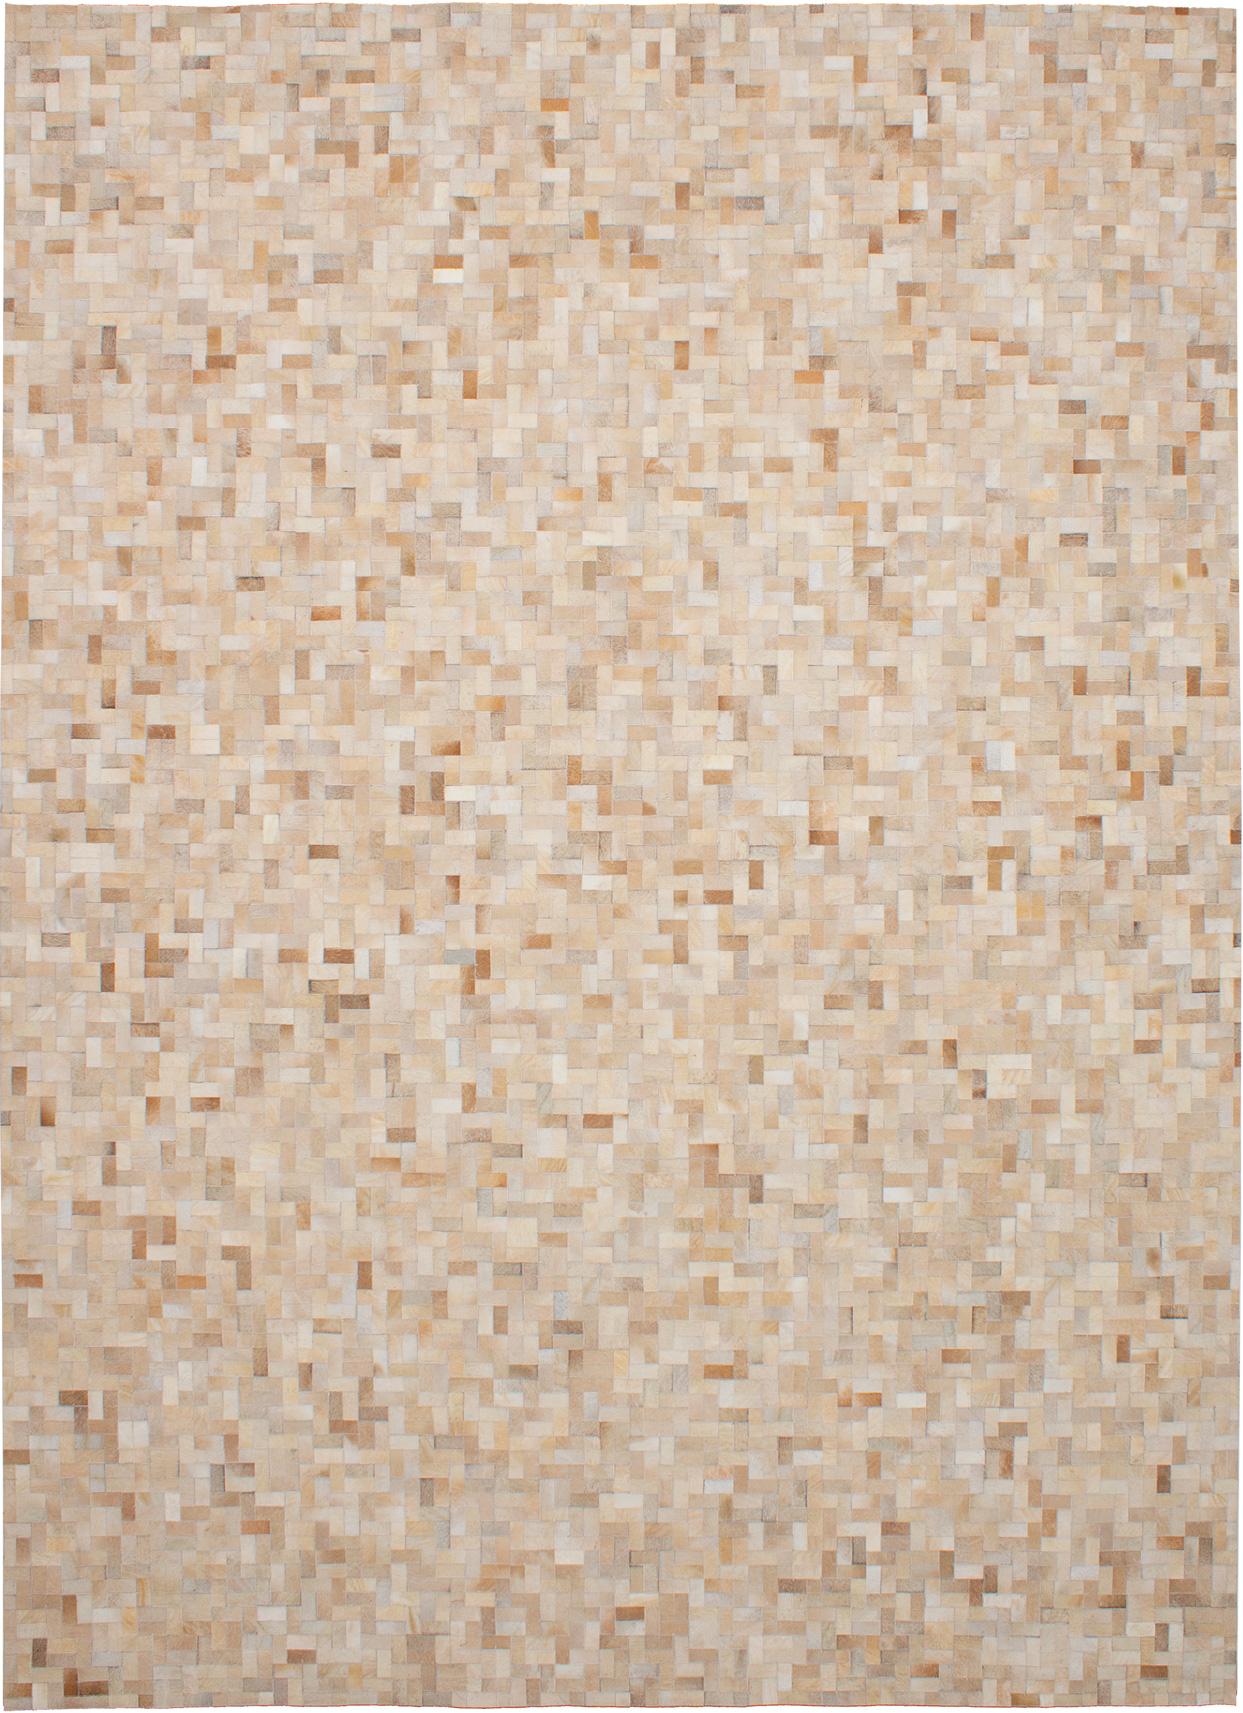 "Handmade Cowhide Patchwork Beige, Cream Leather Rug 9'2"" x 12'3"" Size: 9'2"" x 12'3"""